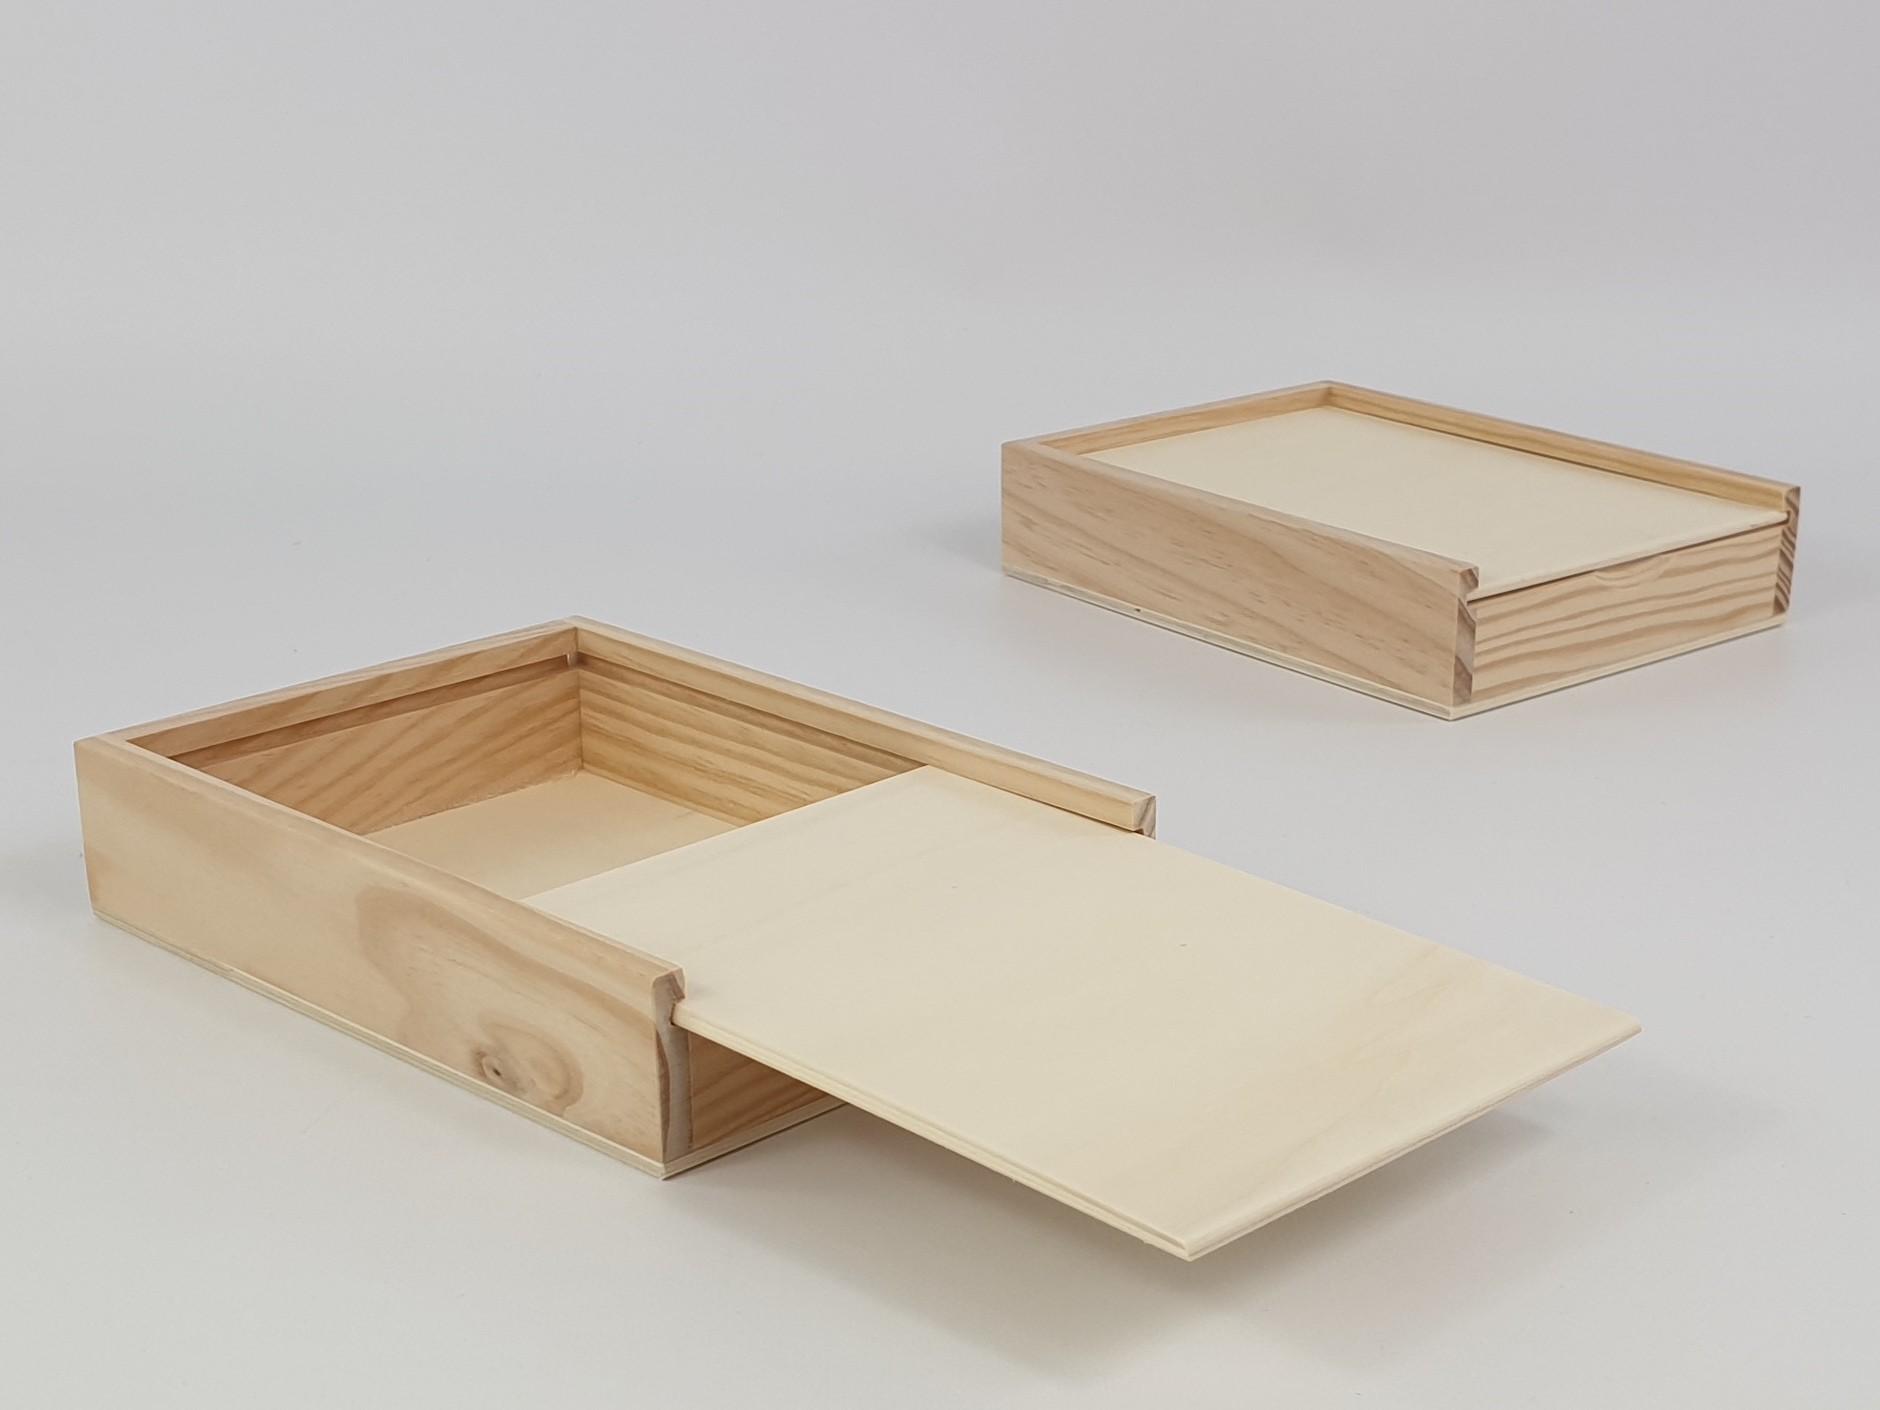 Pine wood box 20x15x3.5 cm. with Sliding Lid Ref.PC6P7B